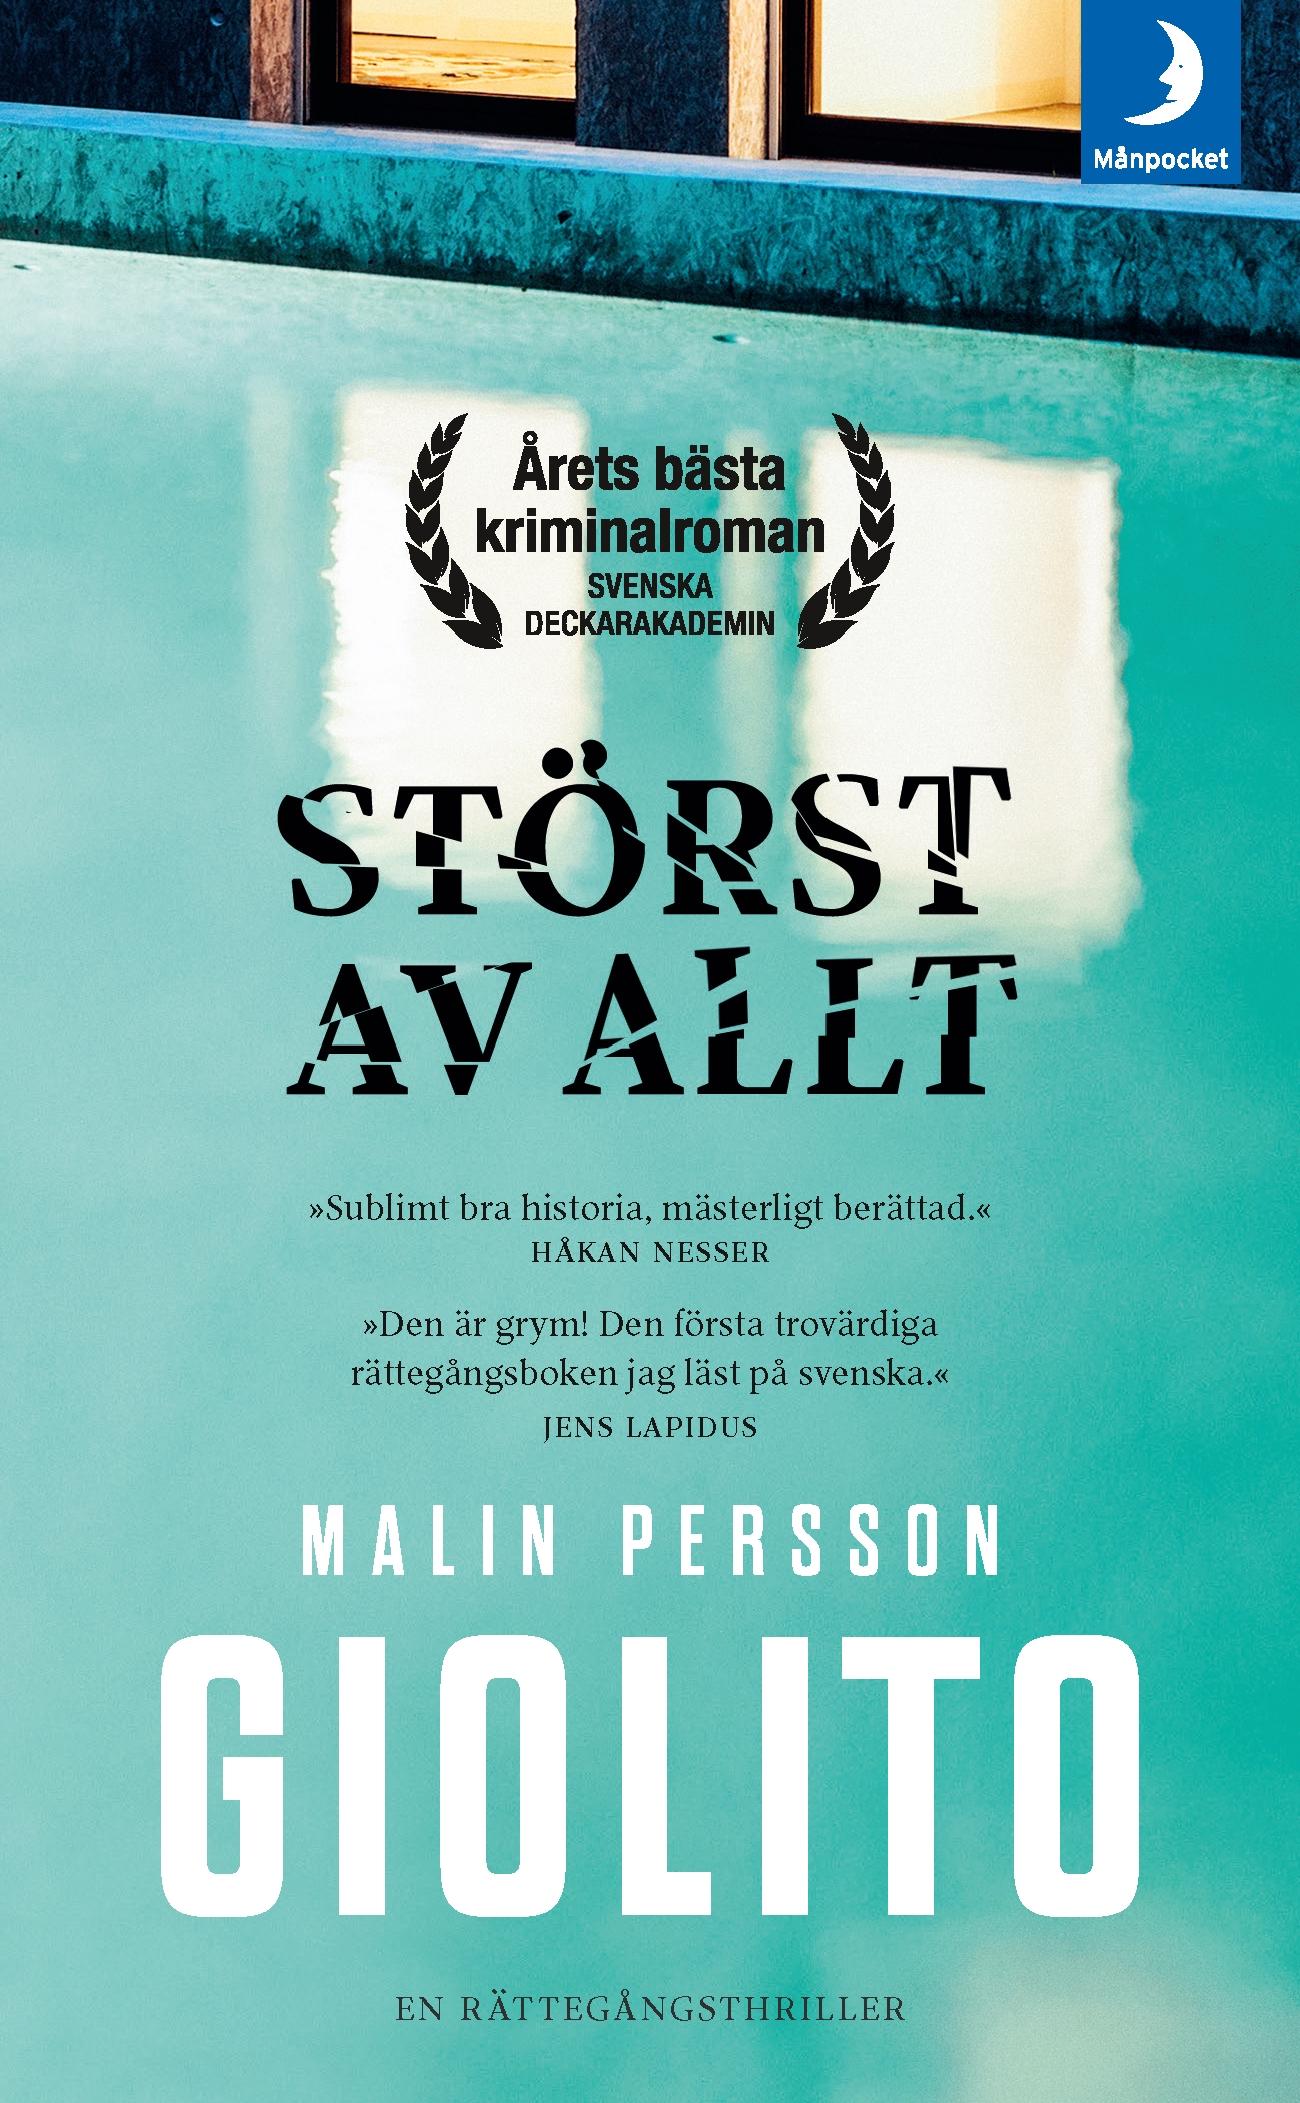 Image for Störst av allt from Suomalainen.com